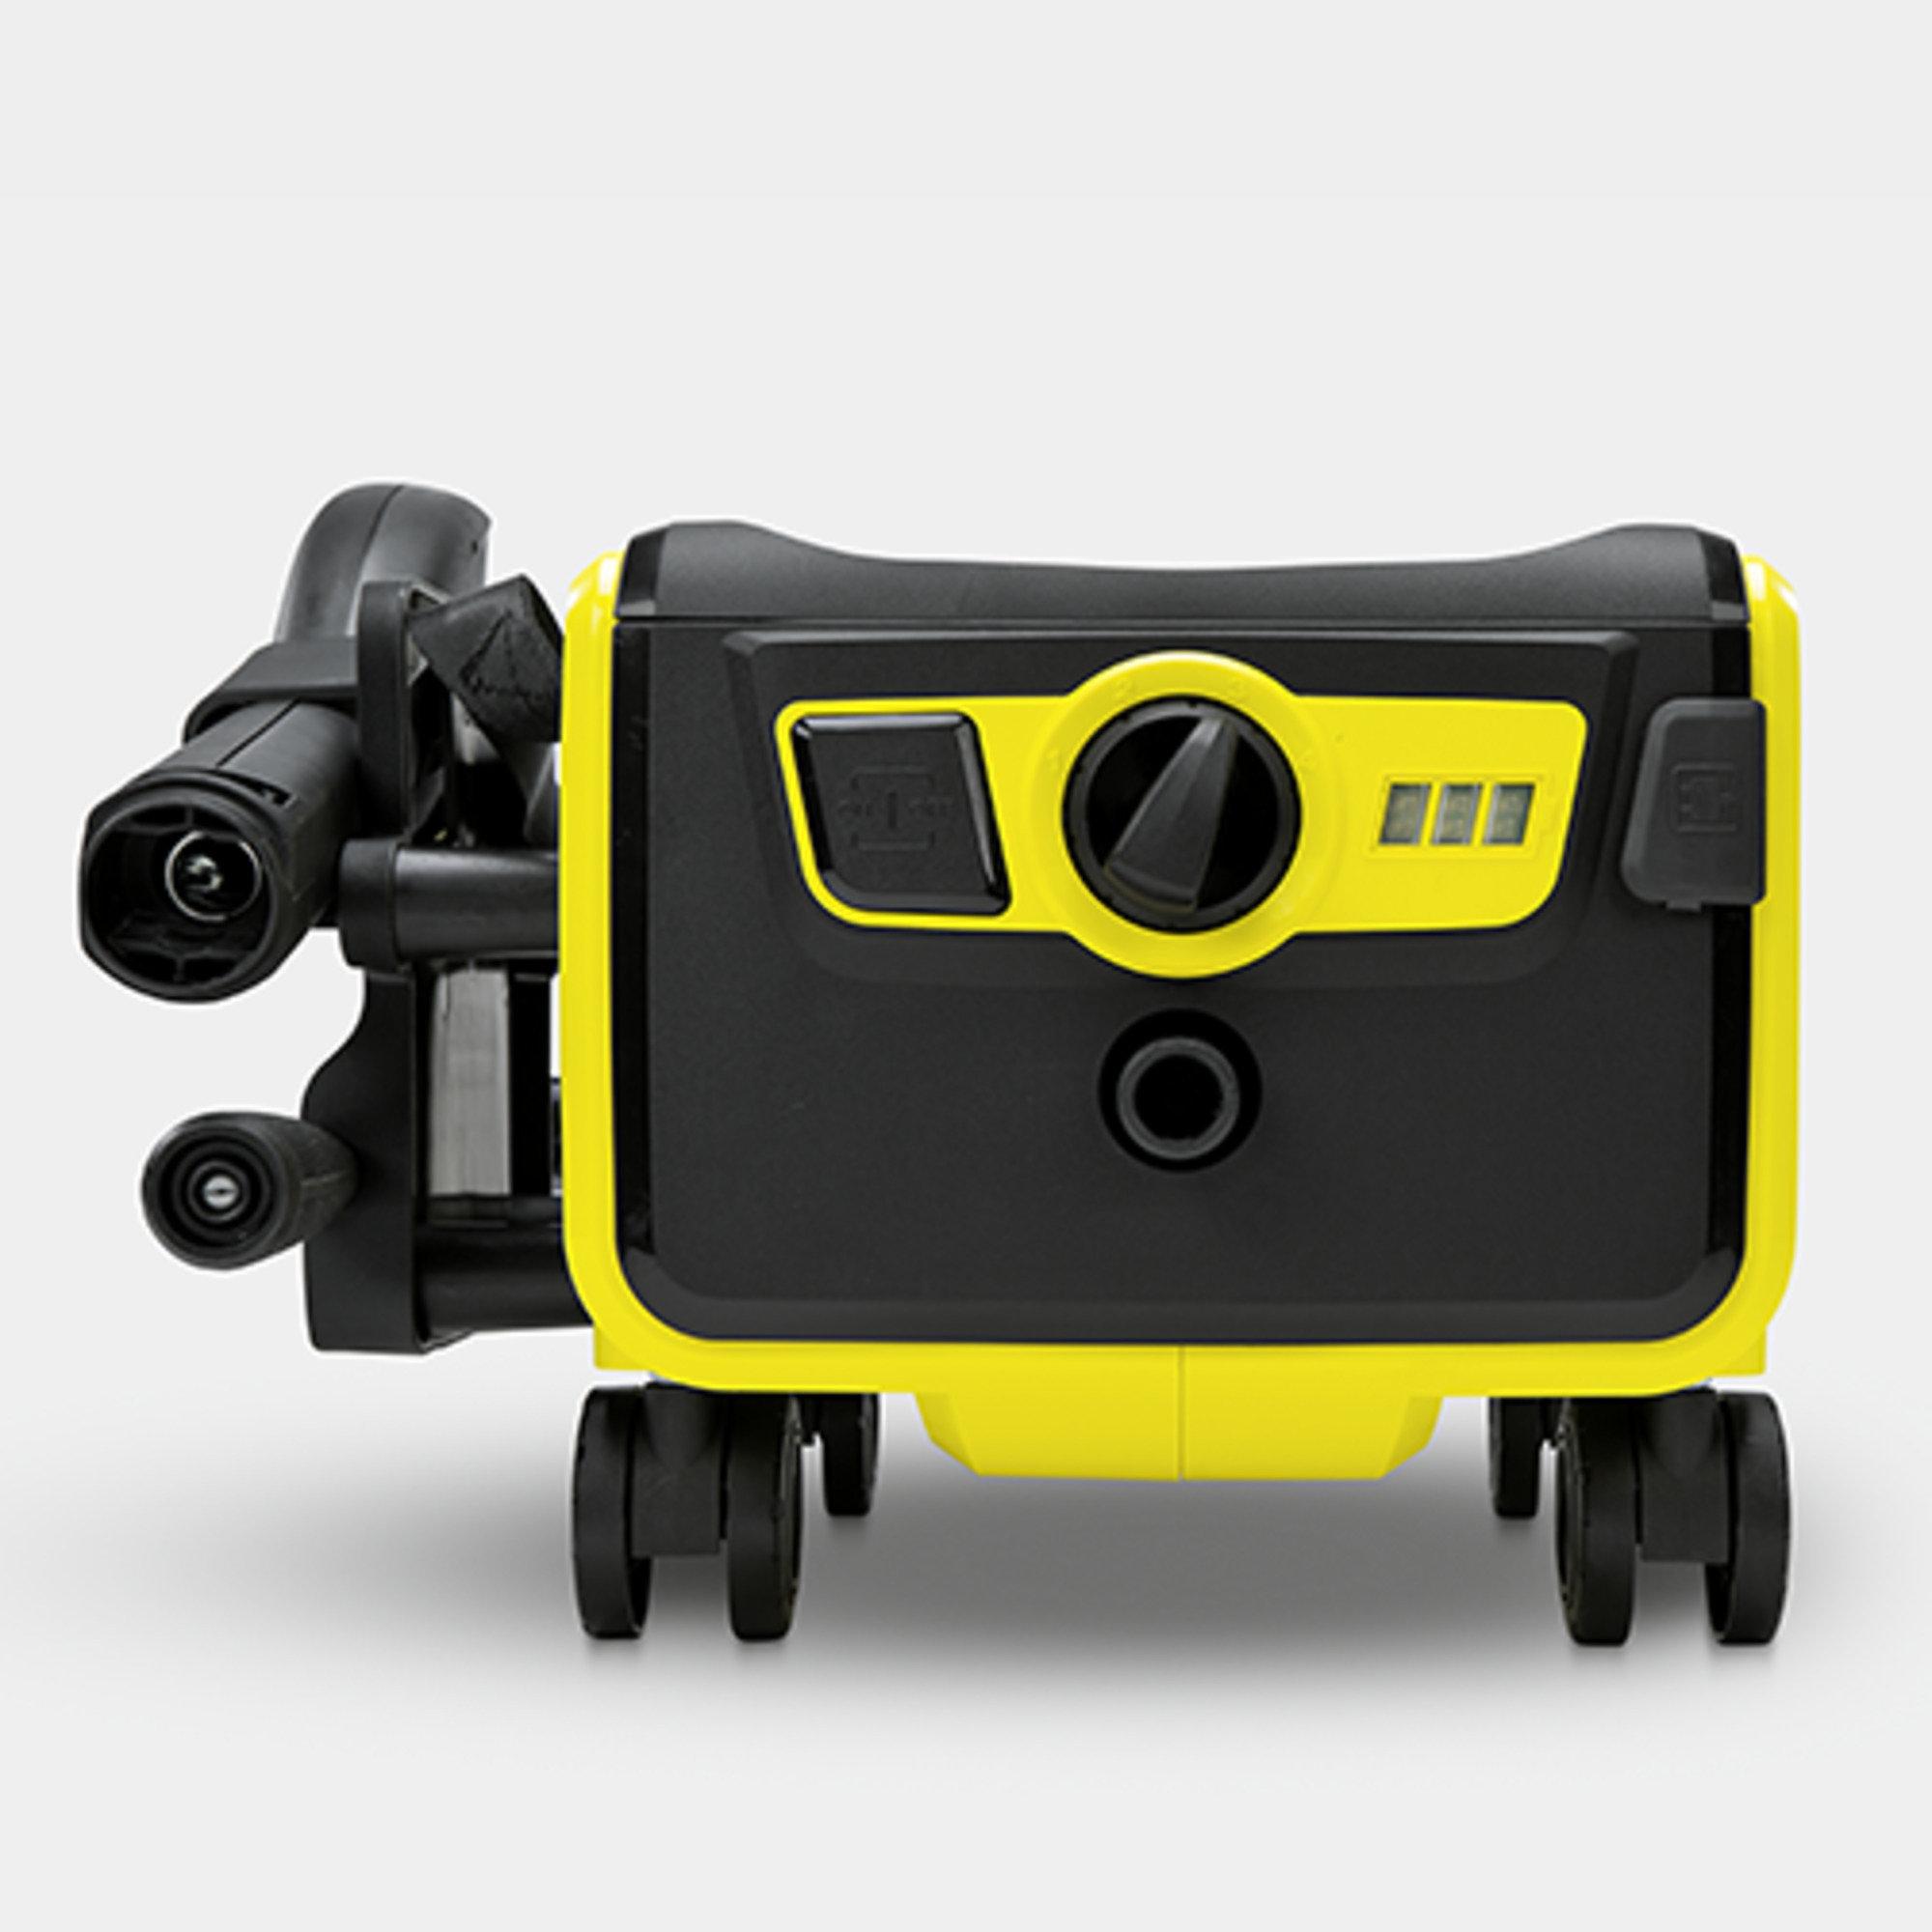 K2 Follow Me無線高壓清洗機 *KAP: 綜合電池